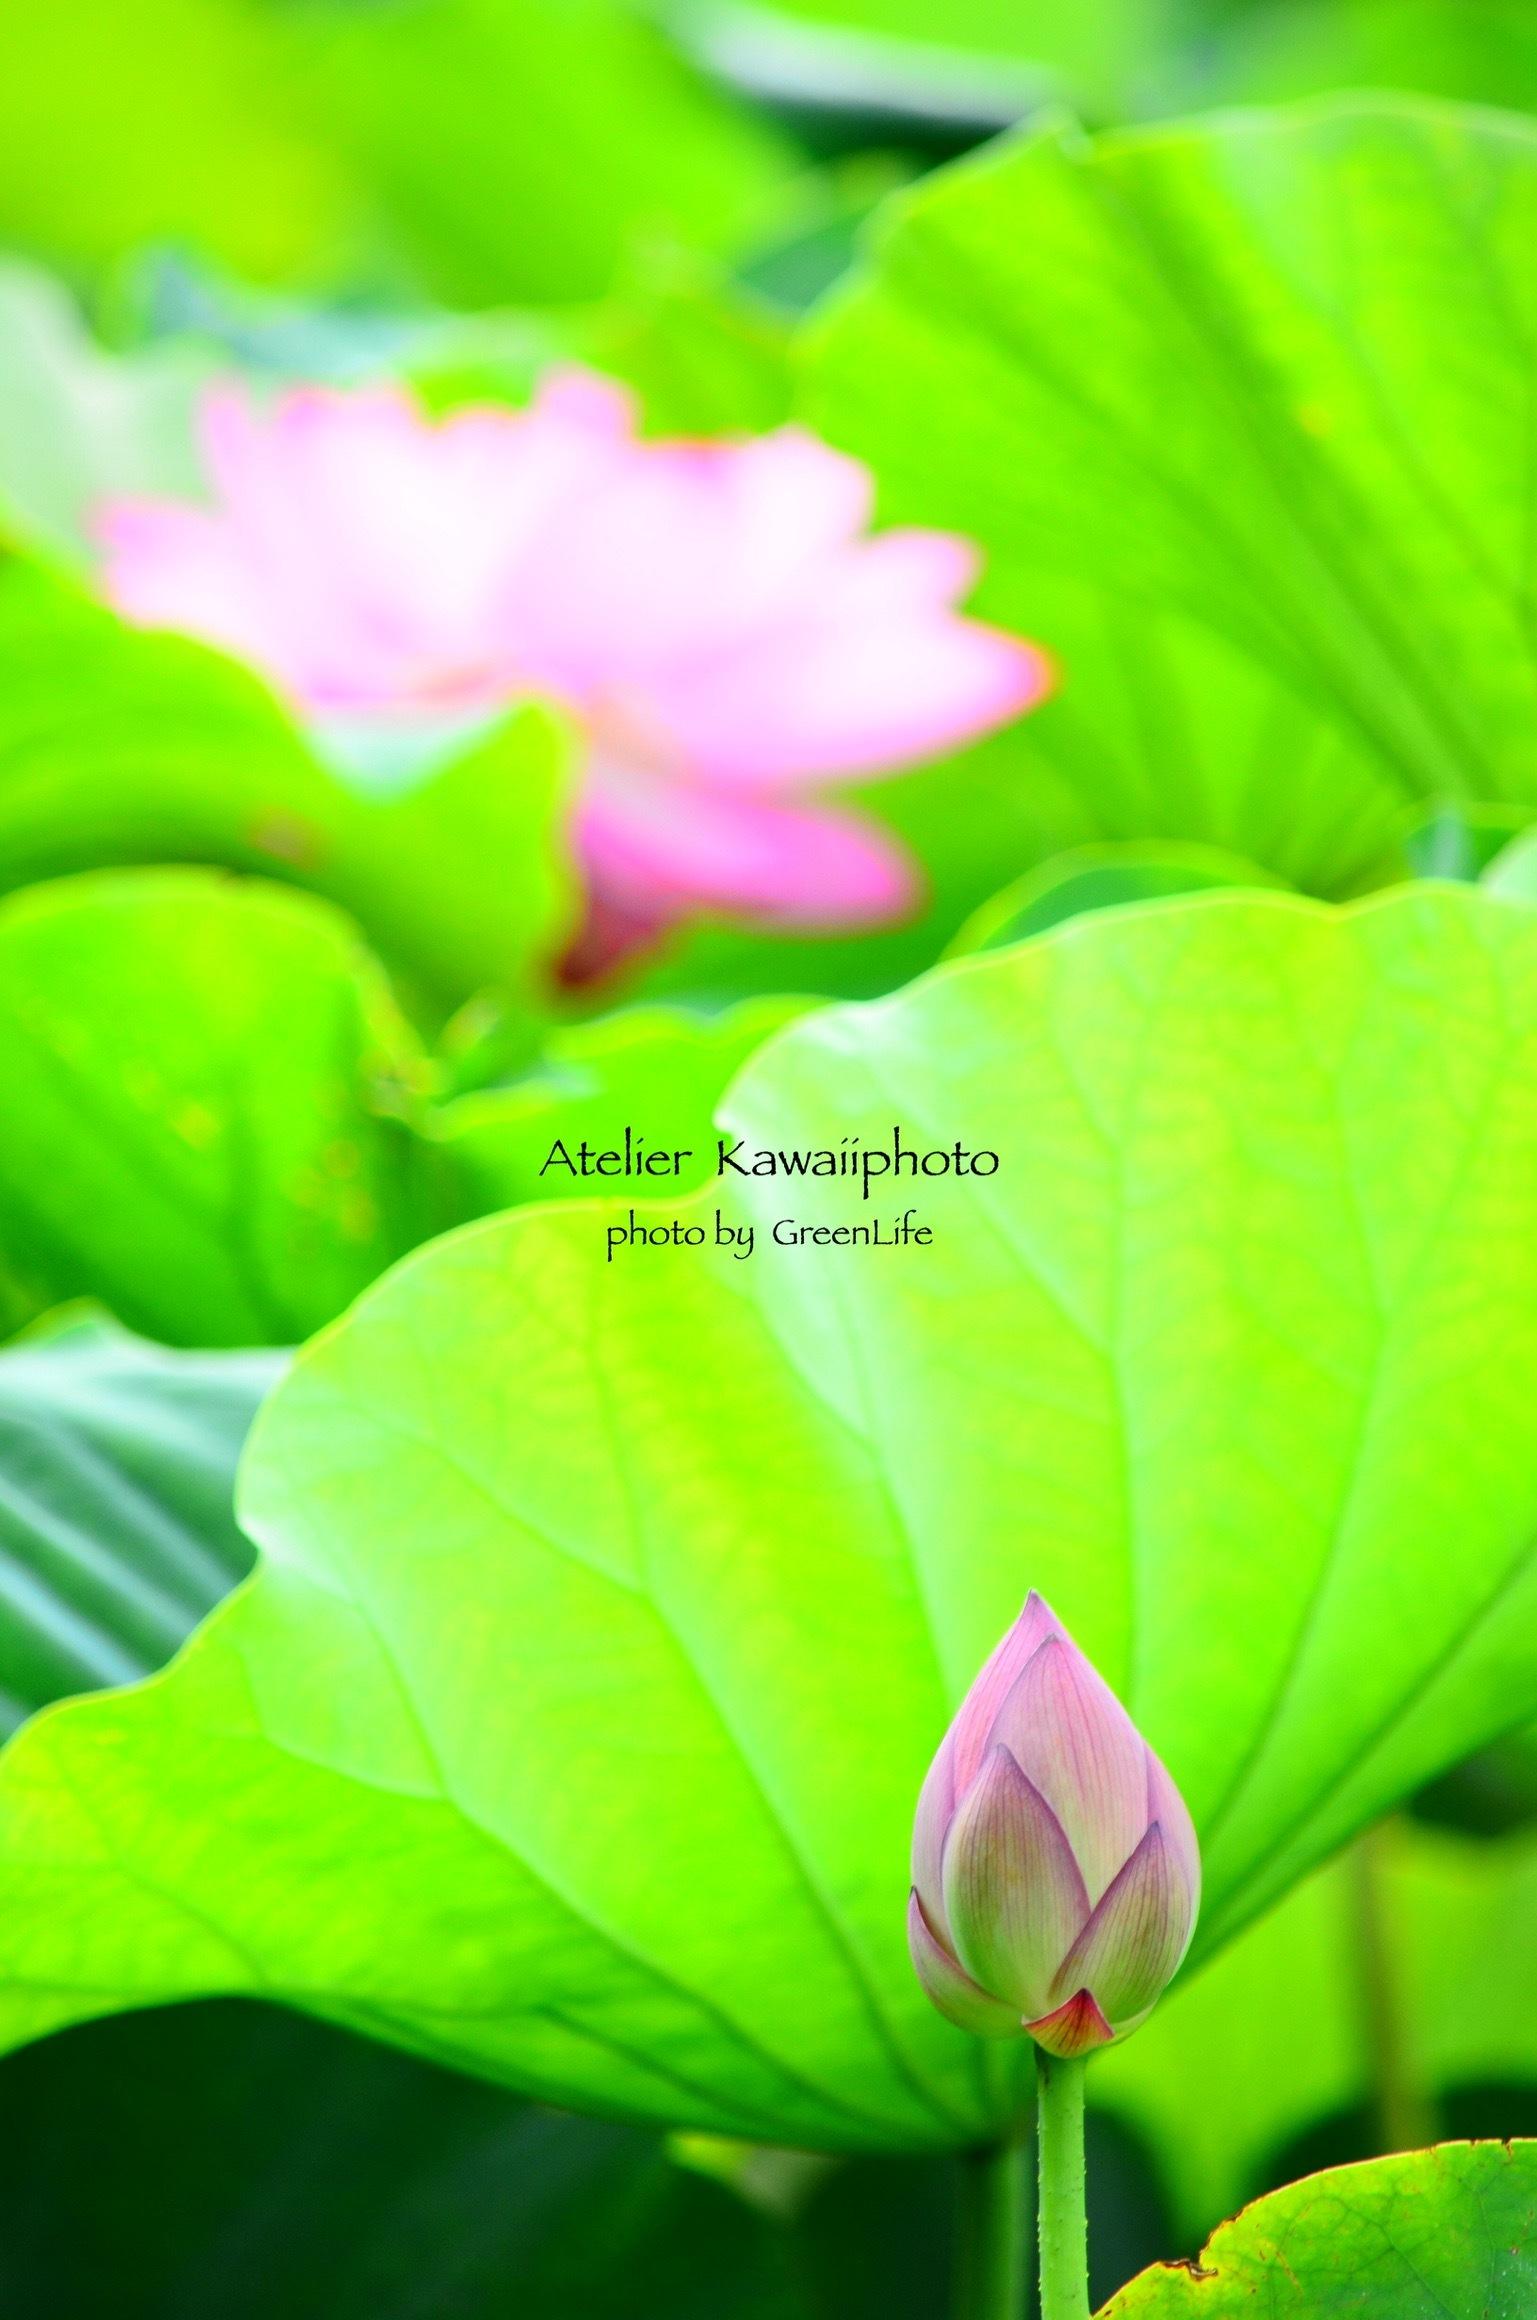 Atelier  Kawaiiphoto 蓮撮影会_f0321522_22443919.jpg